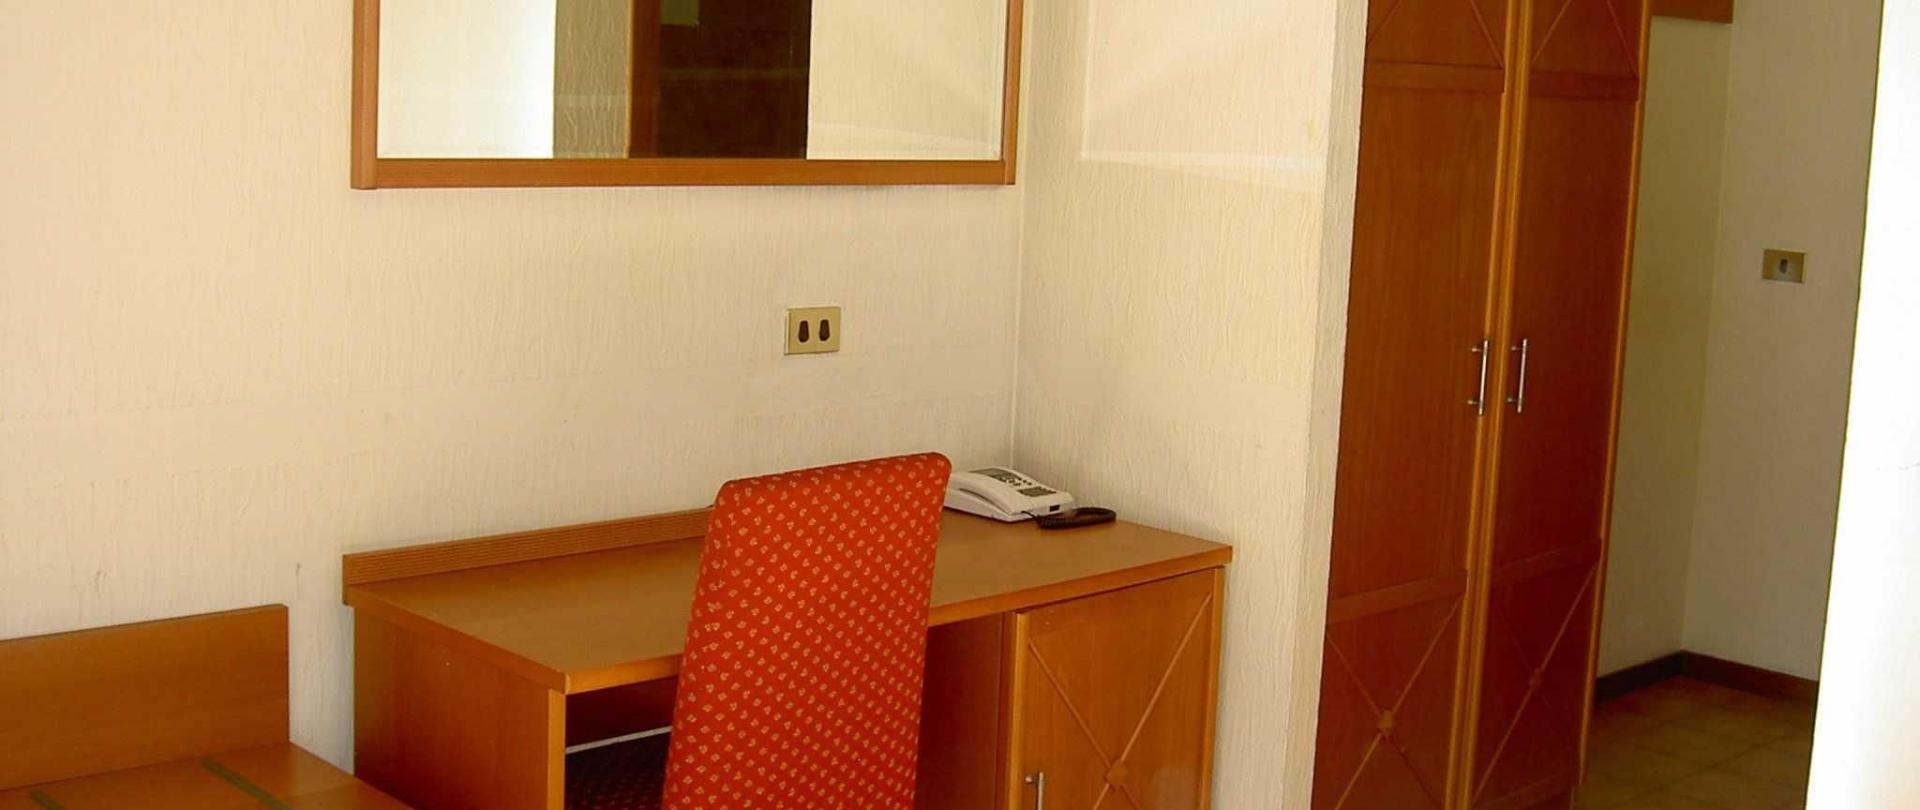 room-013.JPG